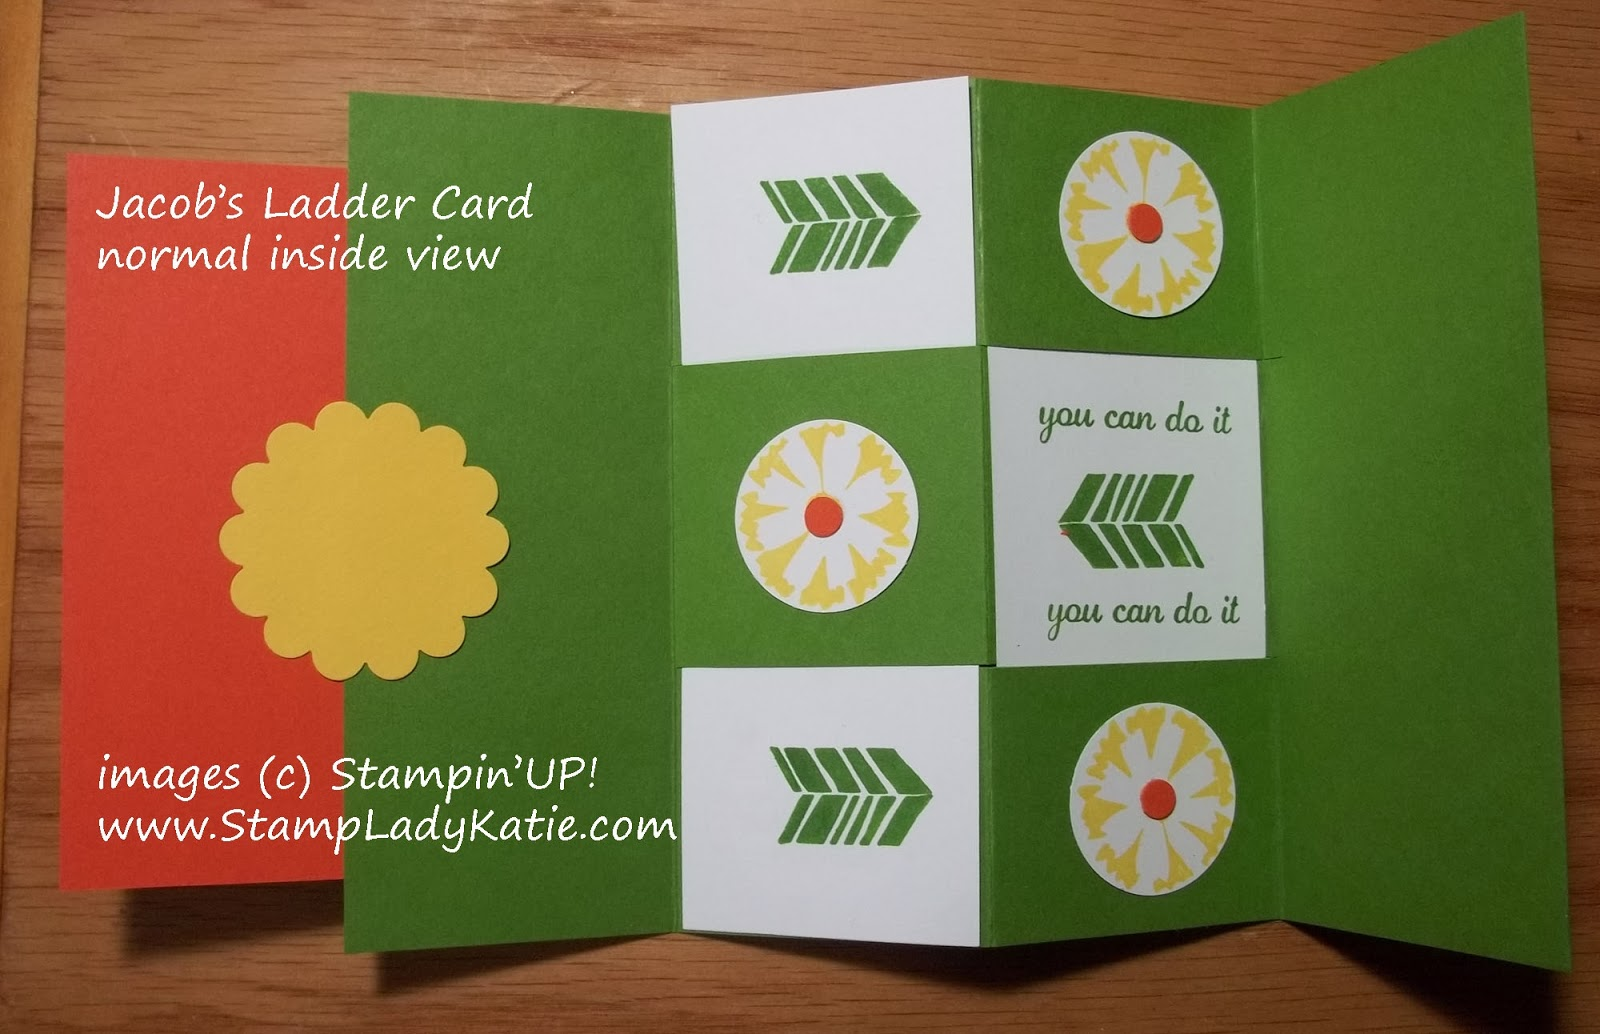 Jacob's Ladder Secret Message Card made with Stampin'UP! Petal Parade Stamp Set